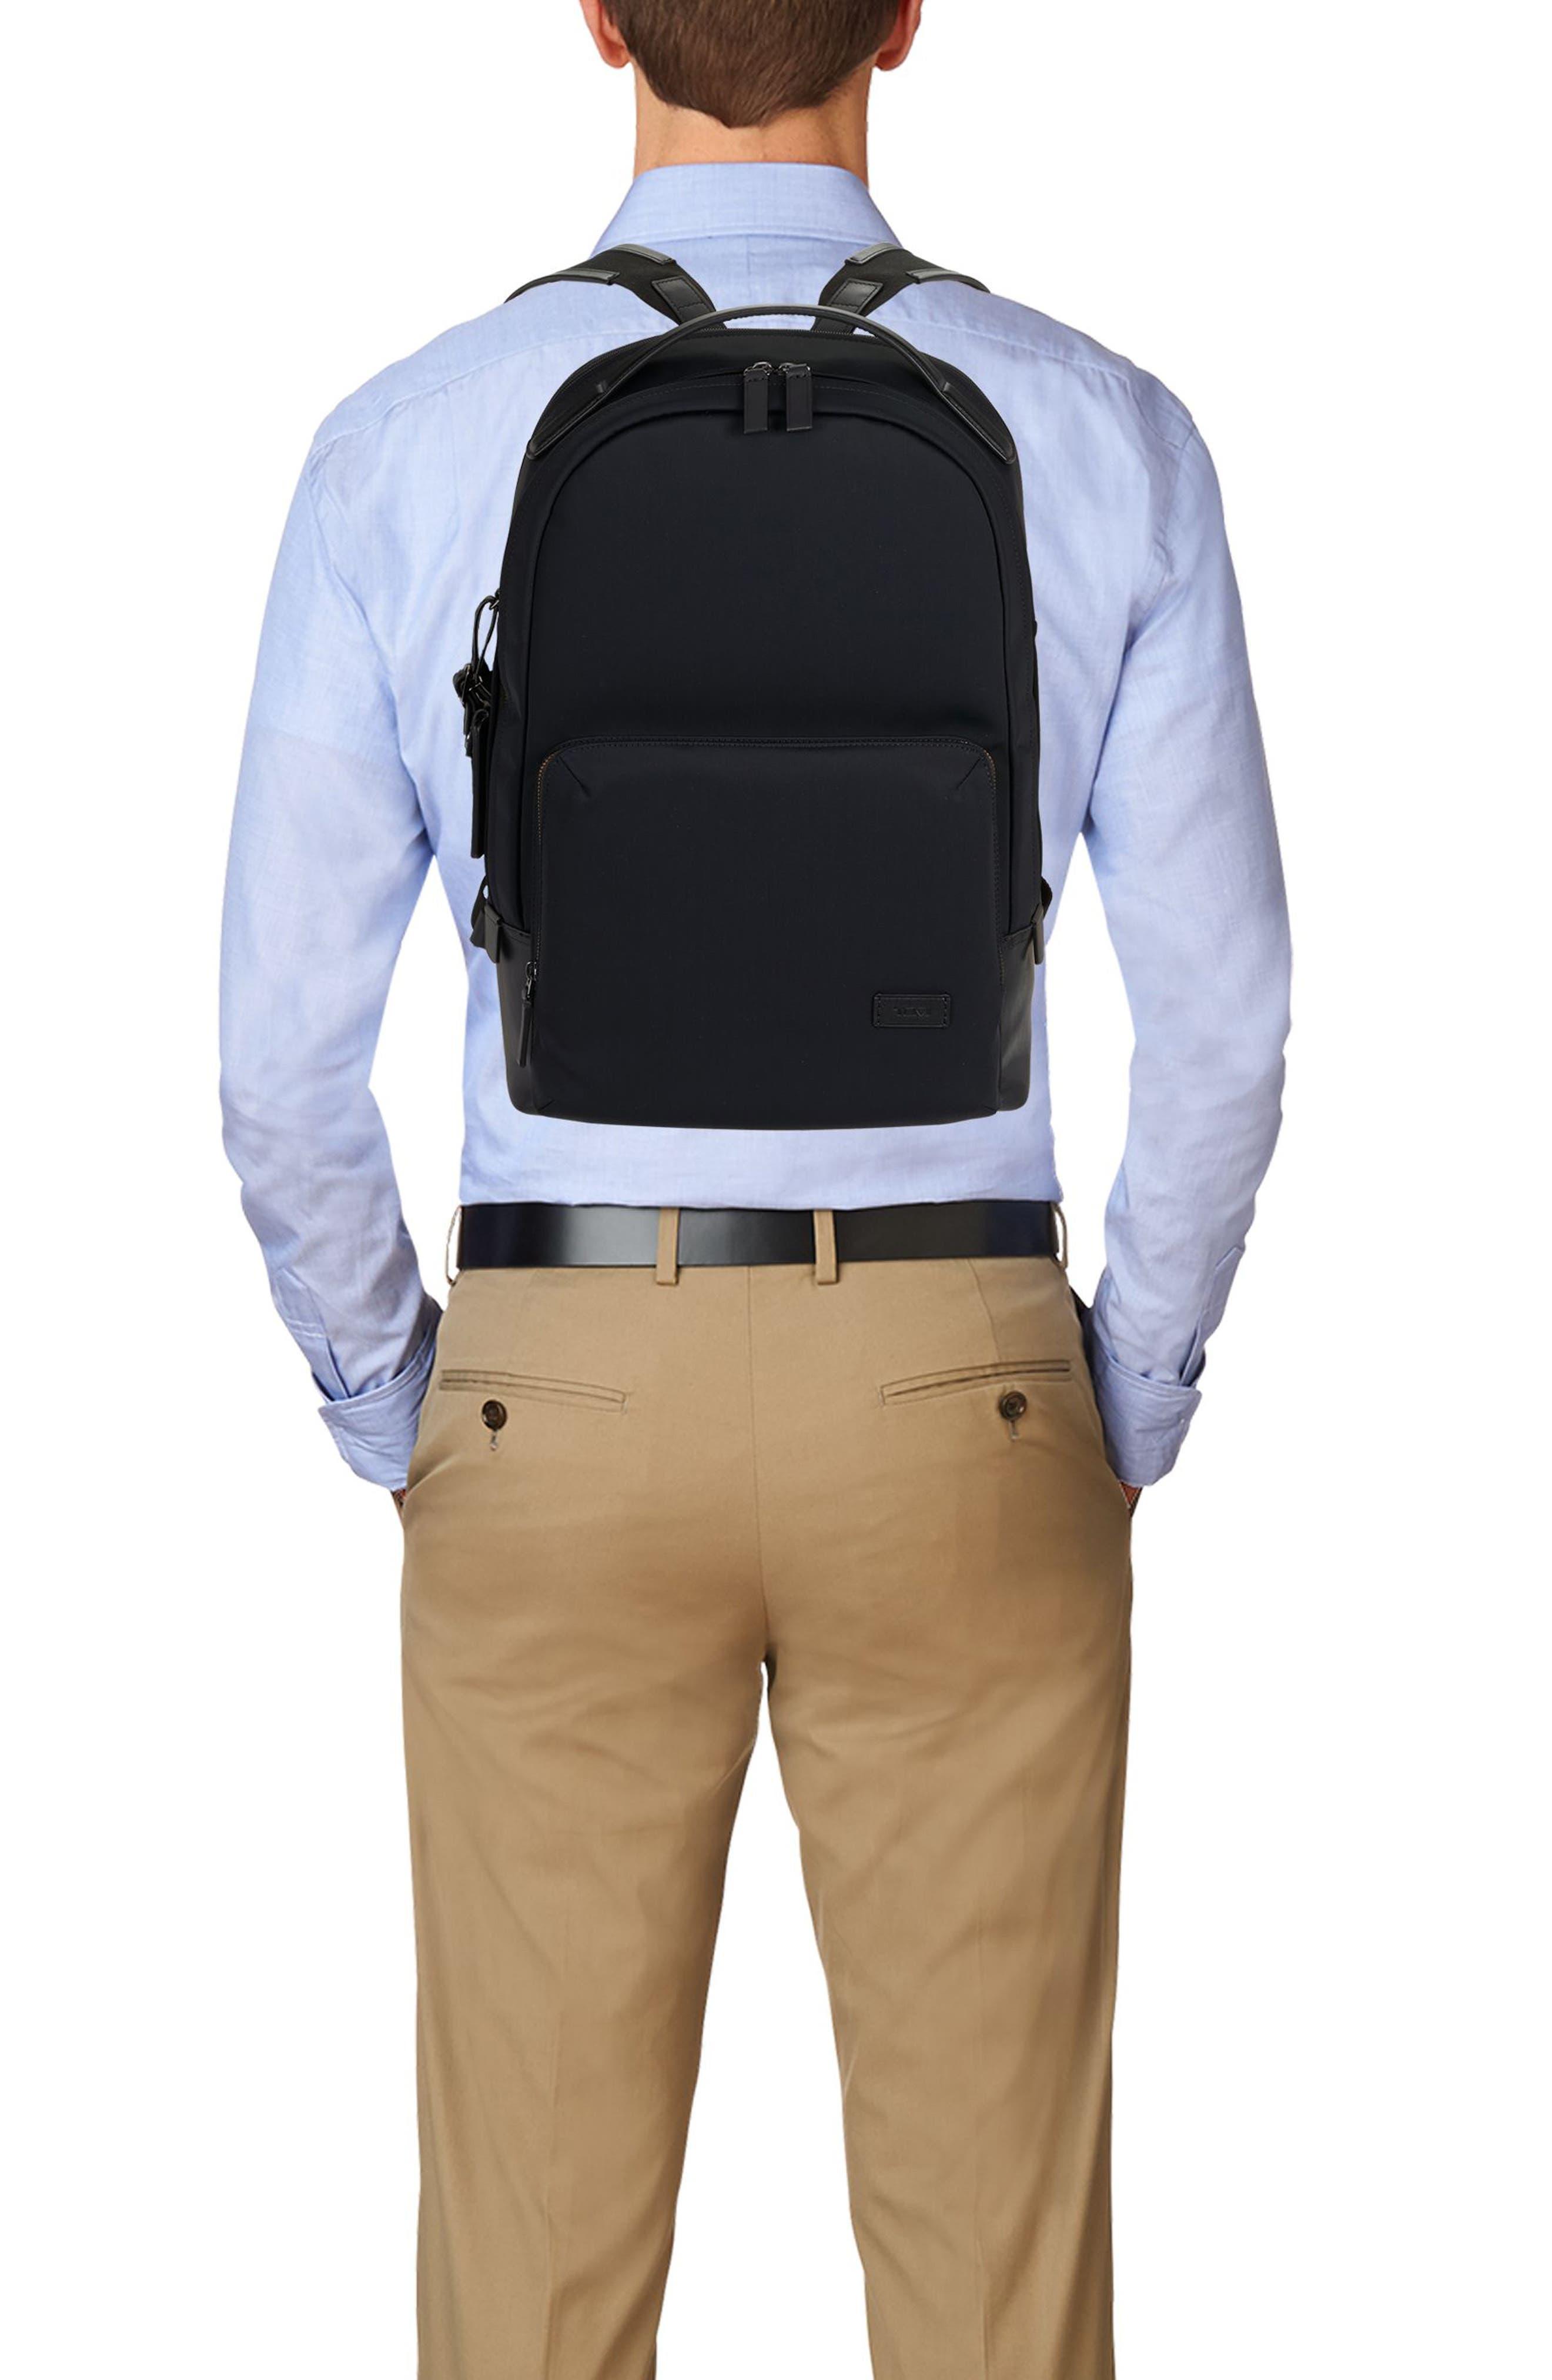 Harrison Webster Backpack,                             Alternate thumbnail 2, color,                             BLACK NYLON